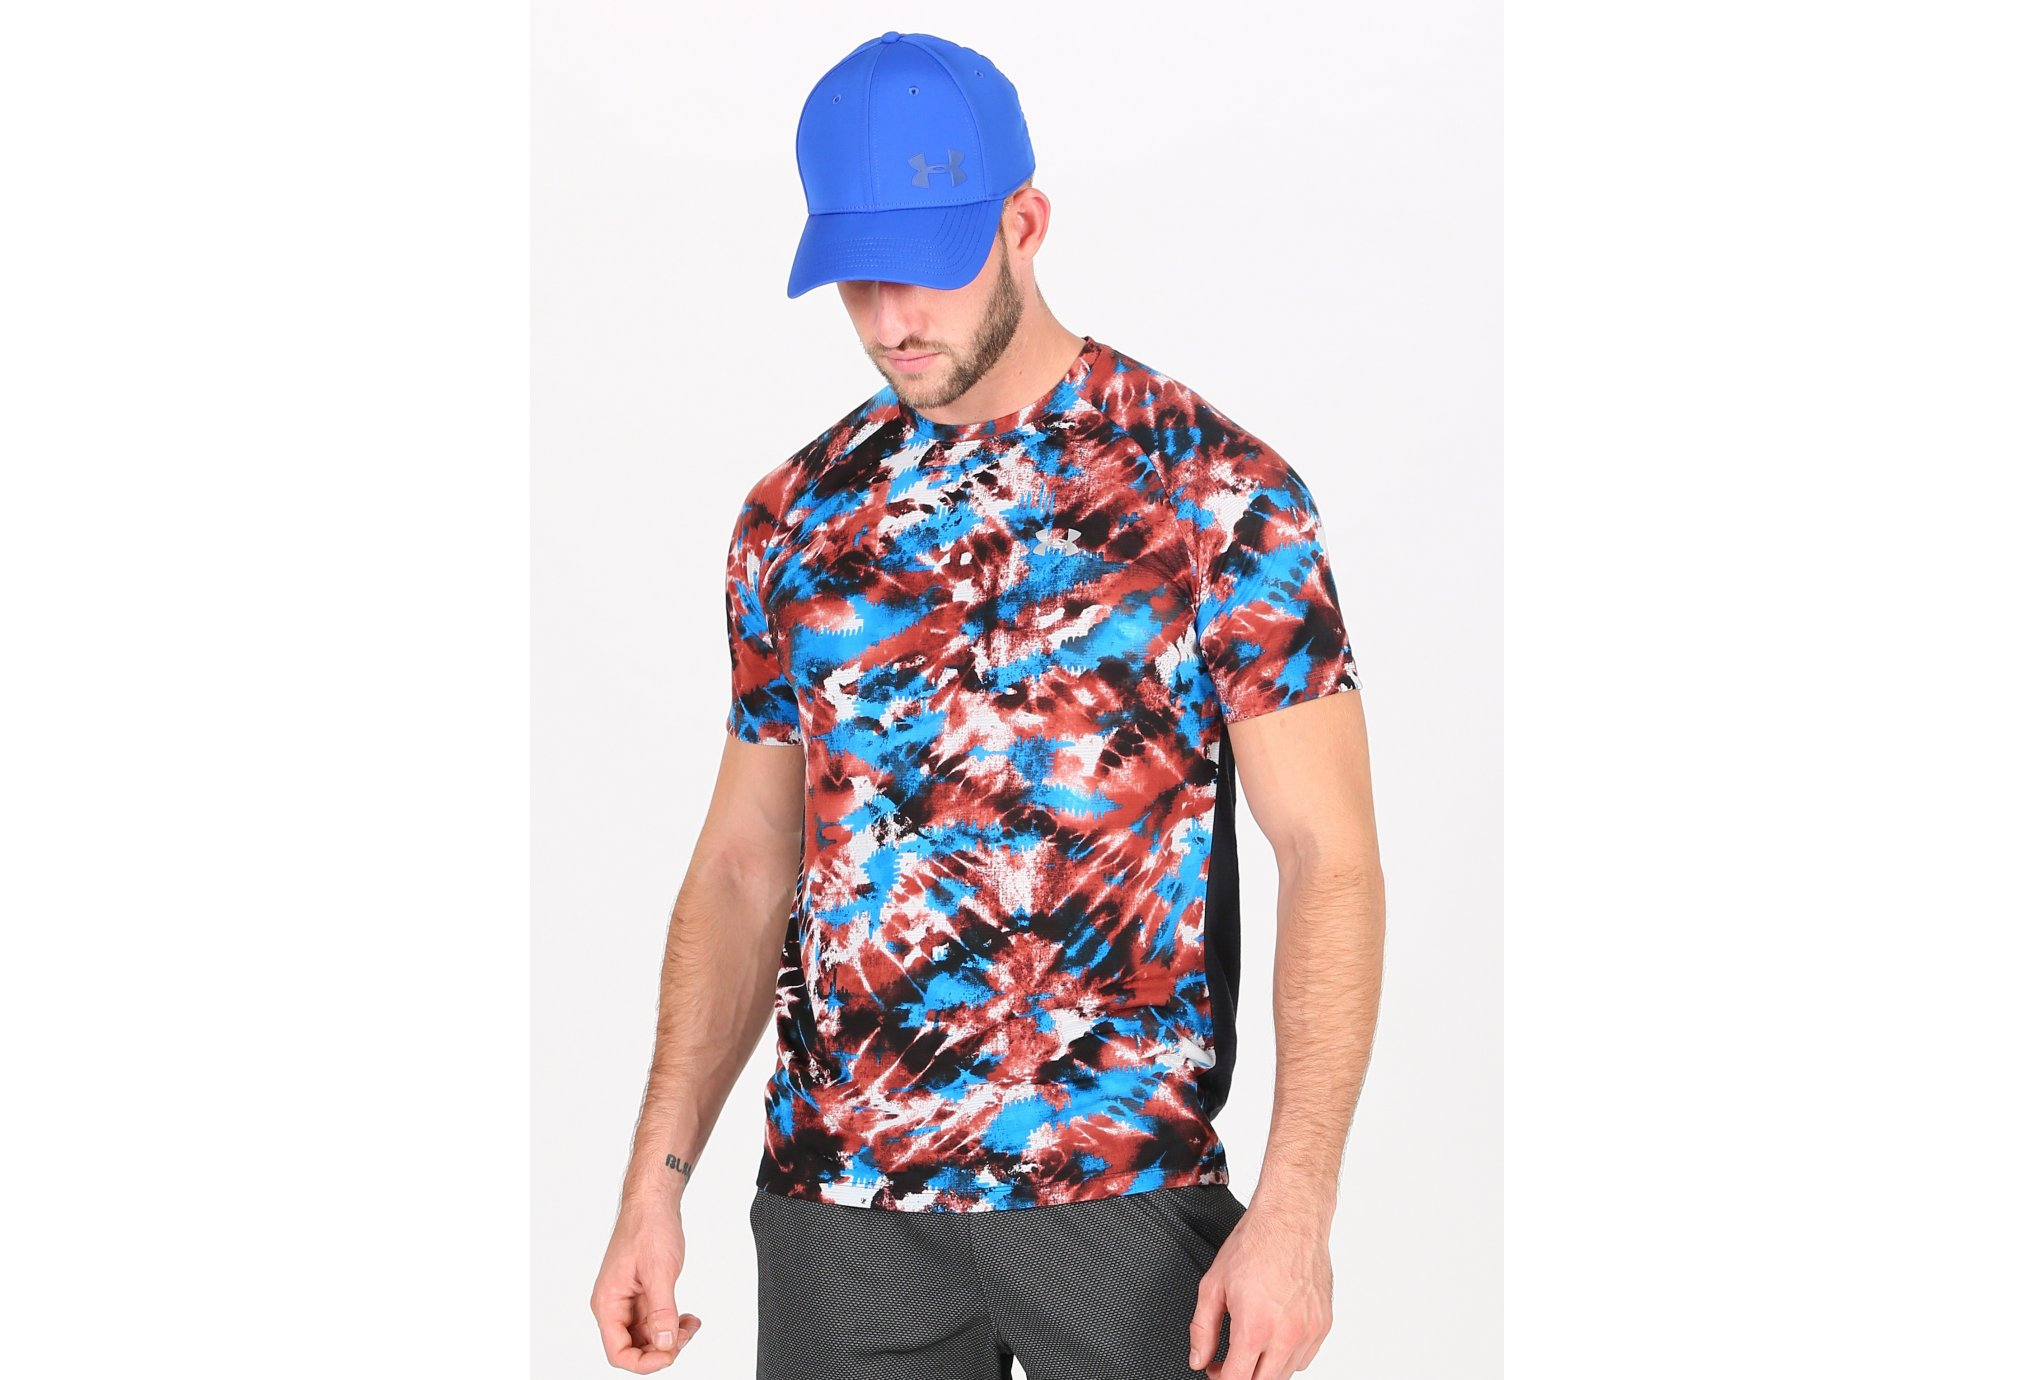 Under Armour Streaker 2.0 Inverse M vêtement running homme